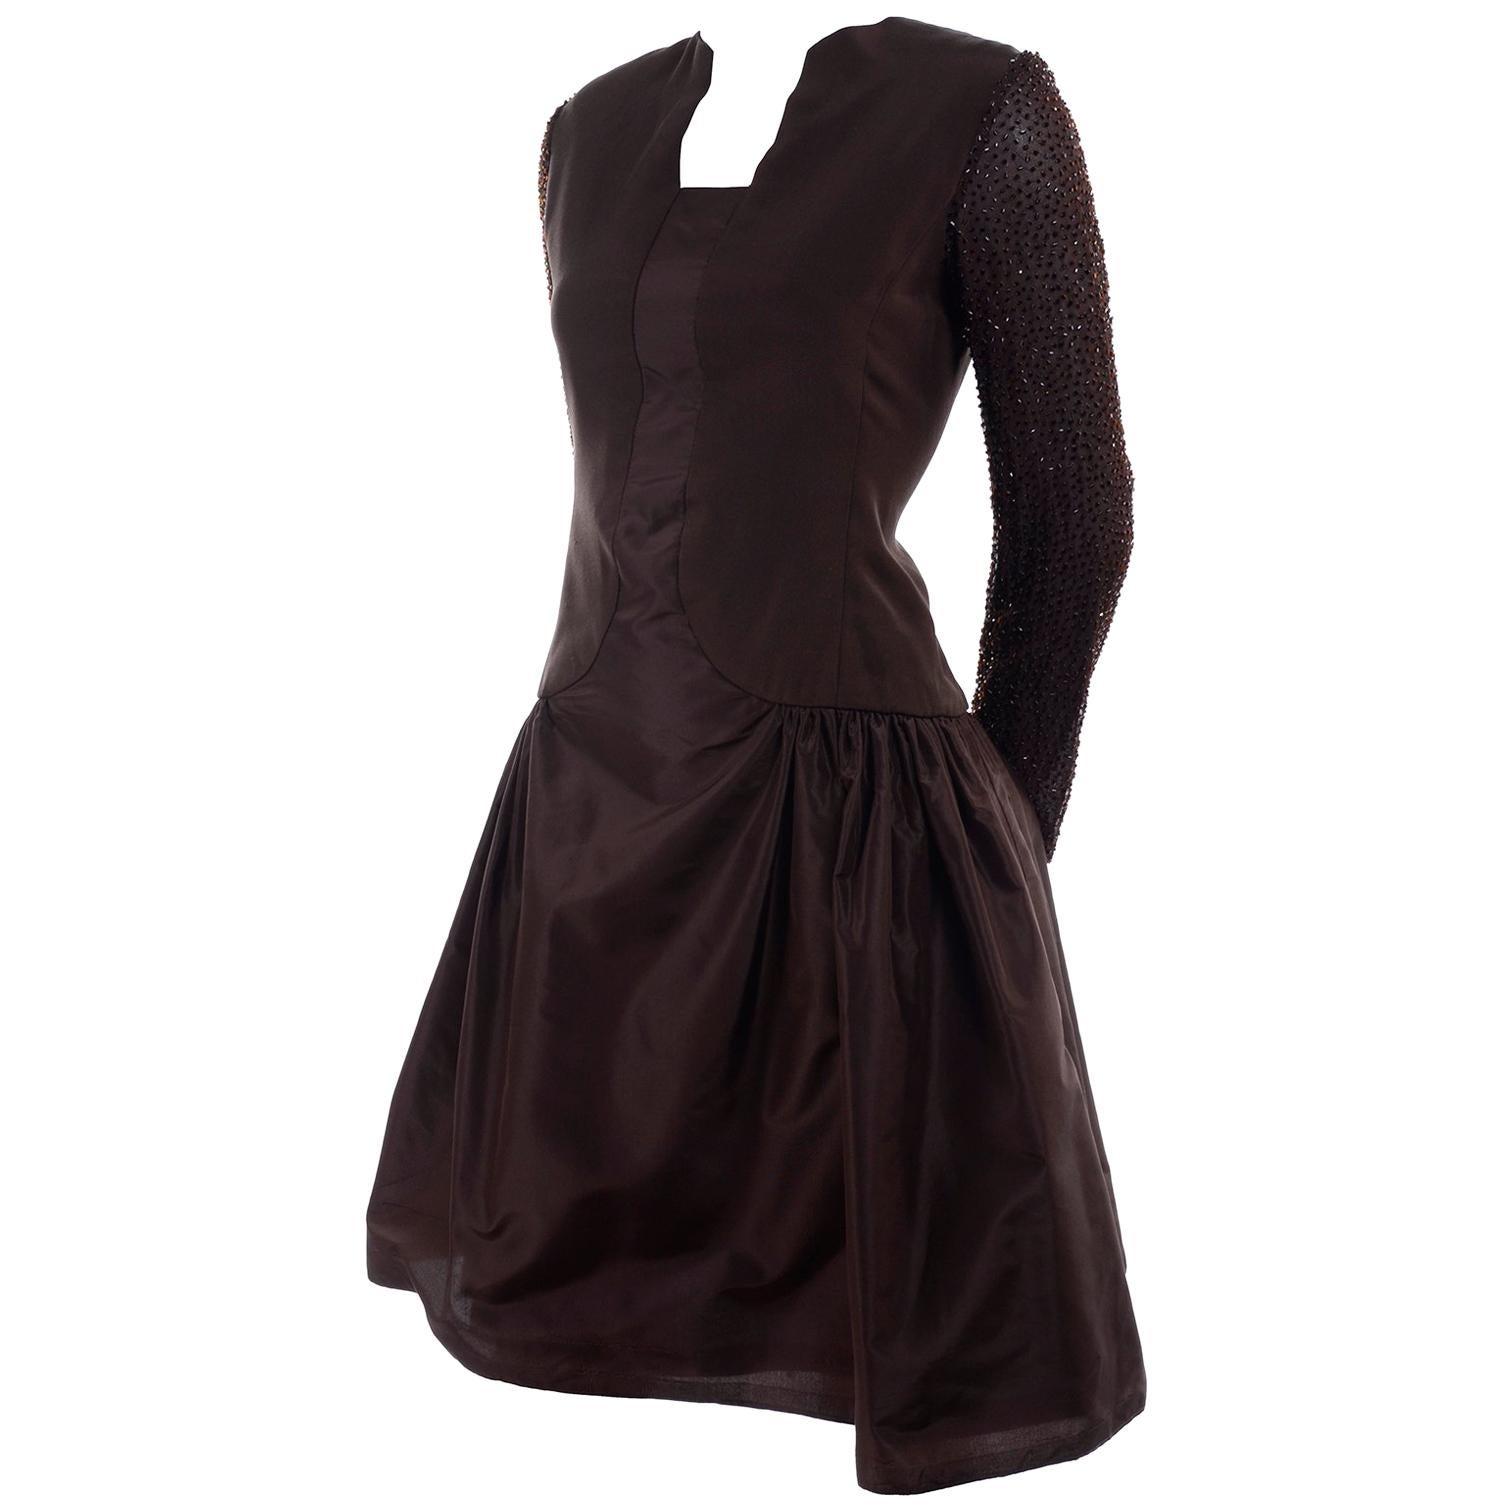 Richilene Vintage Brown Silk and Taffeta Dress With Long Beaded Sleeves, 1980s